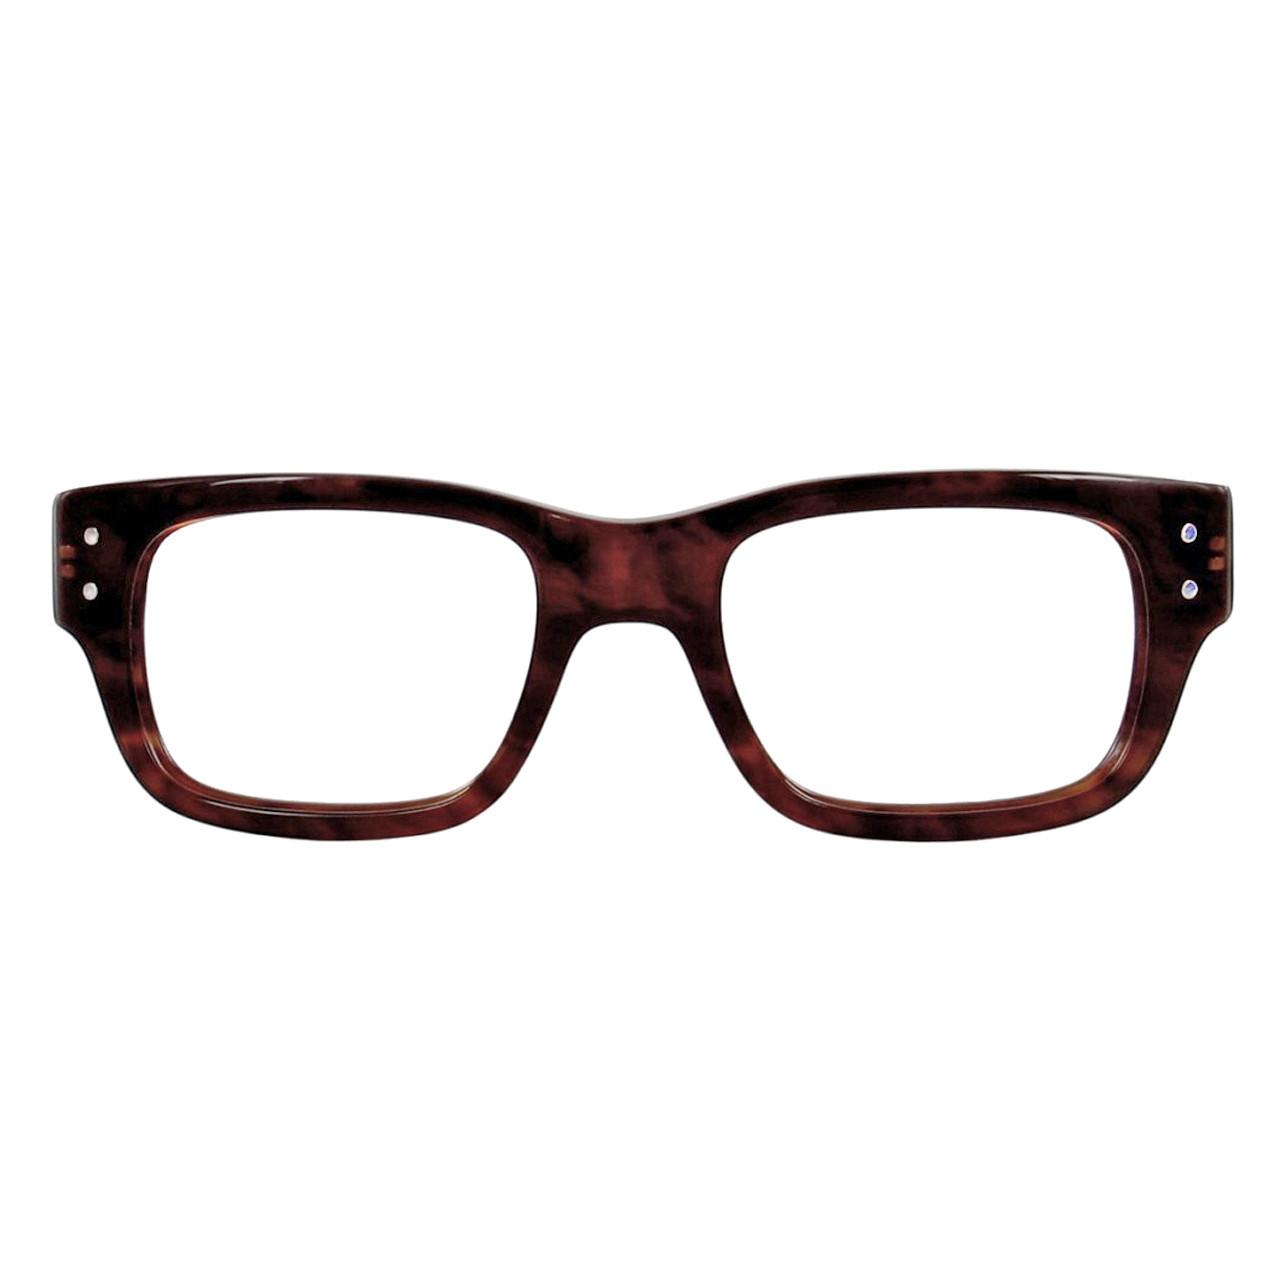 GEEK Eyewear GEEK 103